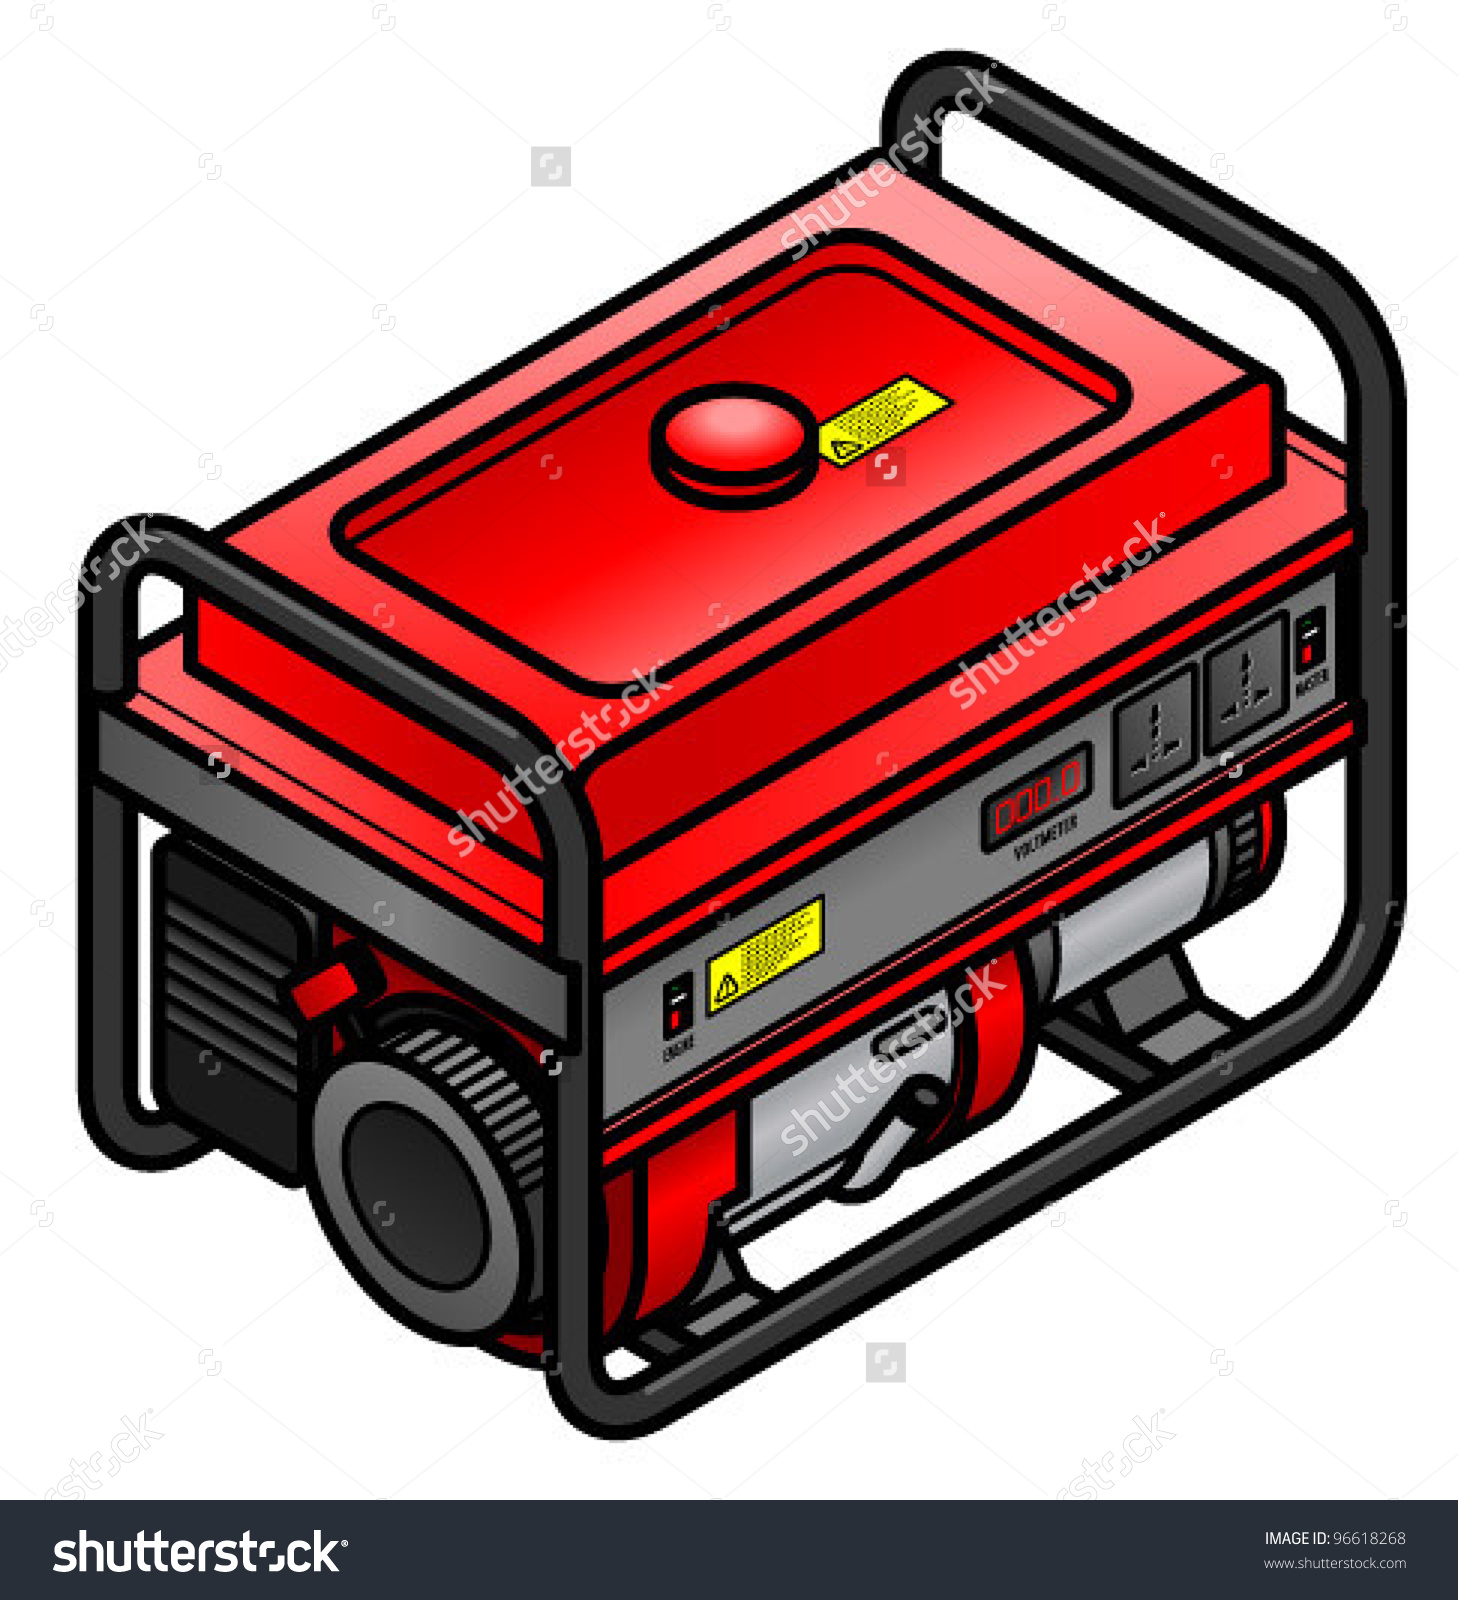 Power generator clip art.